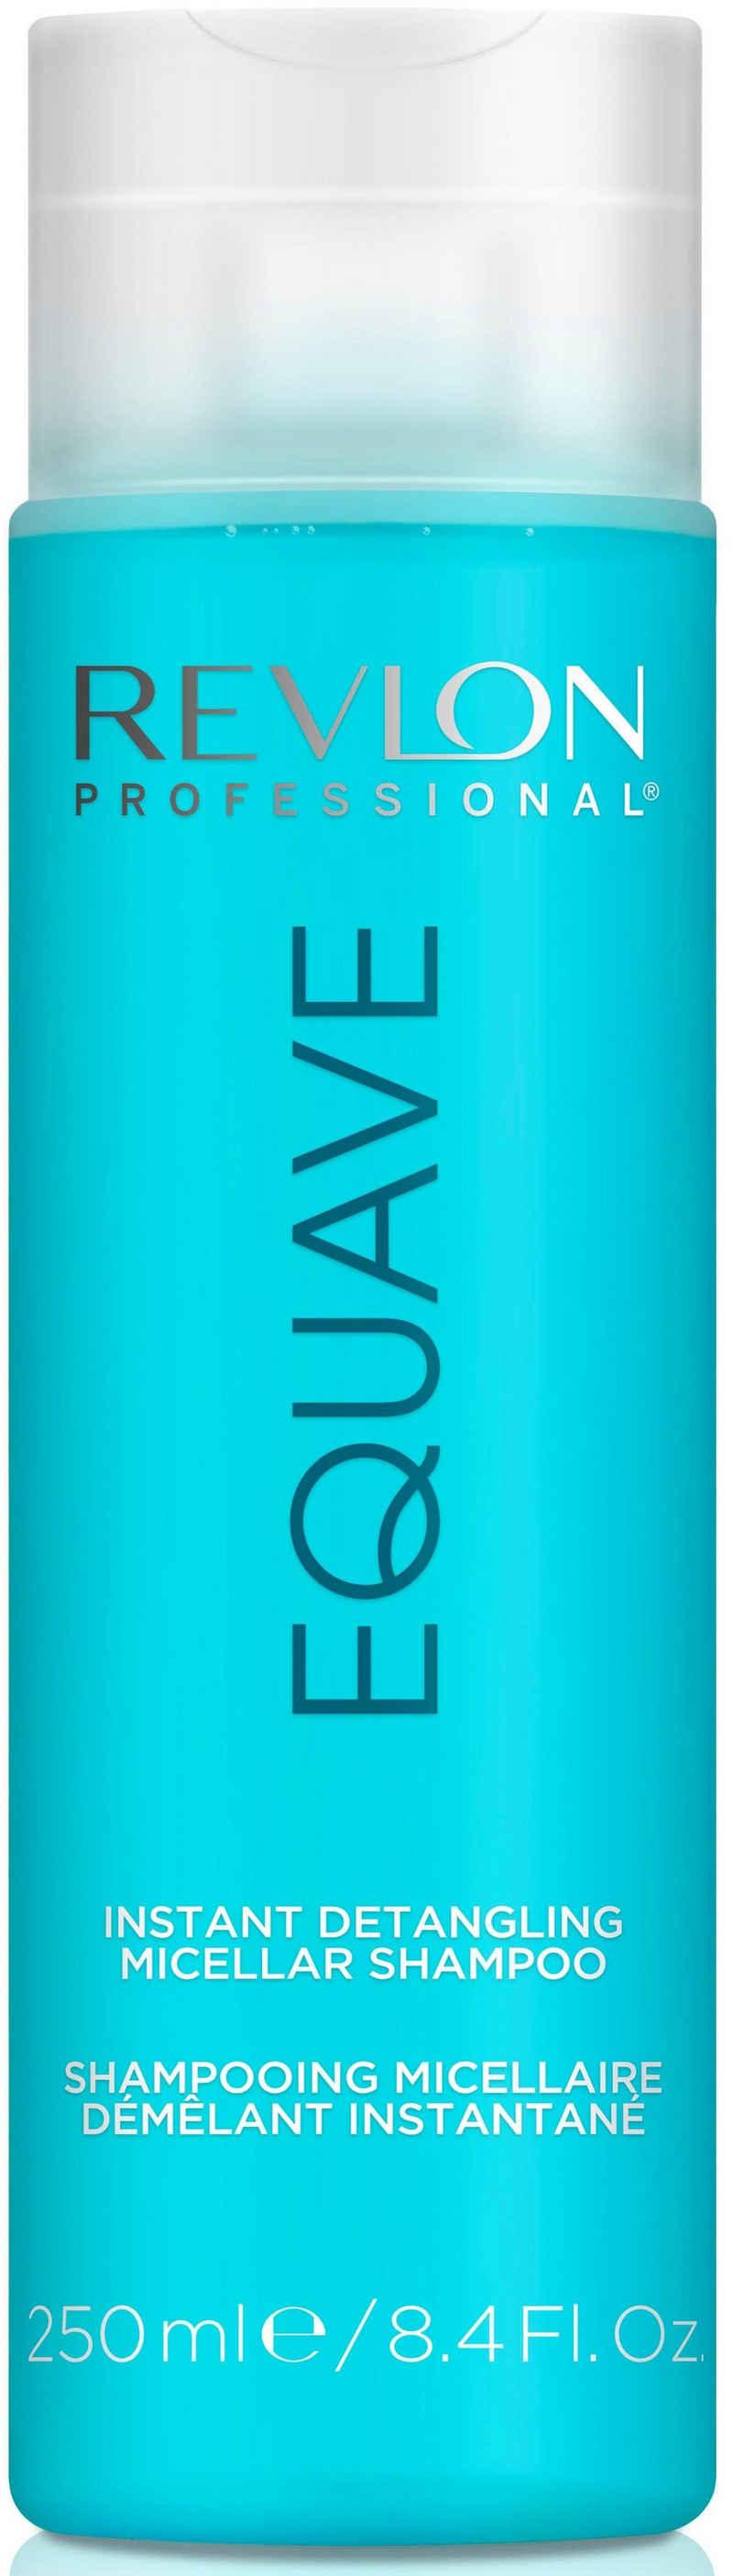 REVLON PROFESSIONAL Haarshampoo »Equave Instant Detangling Micellar Shampoo«, sofort entwirrend